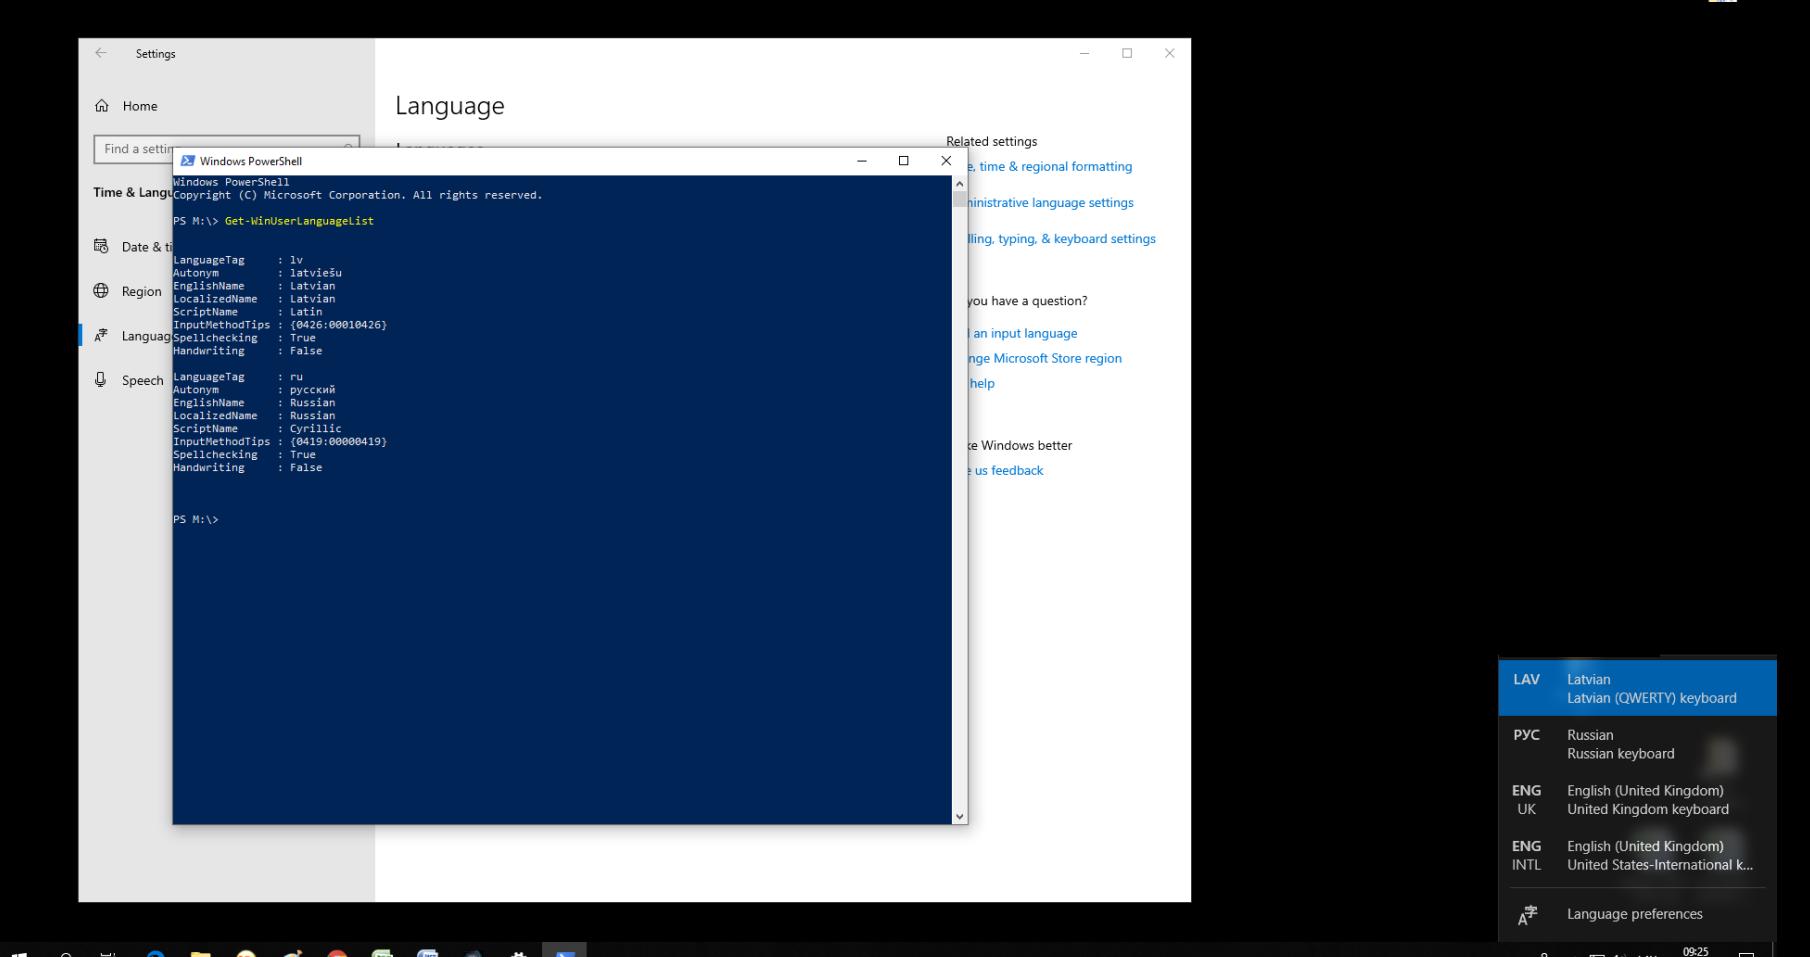 Windows10 20H2 Language preferences bug? d965b283-3a45-4b20-8733-c5c54f6a6552?upload=true.png